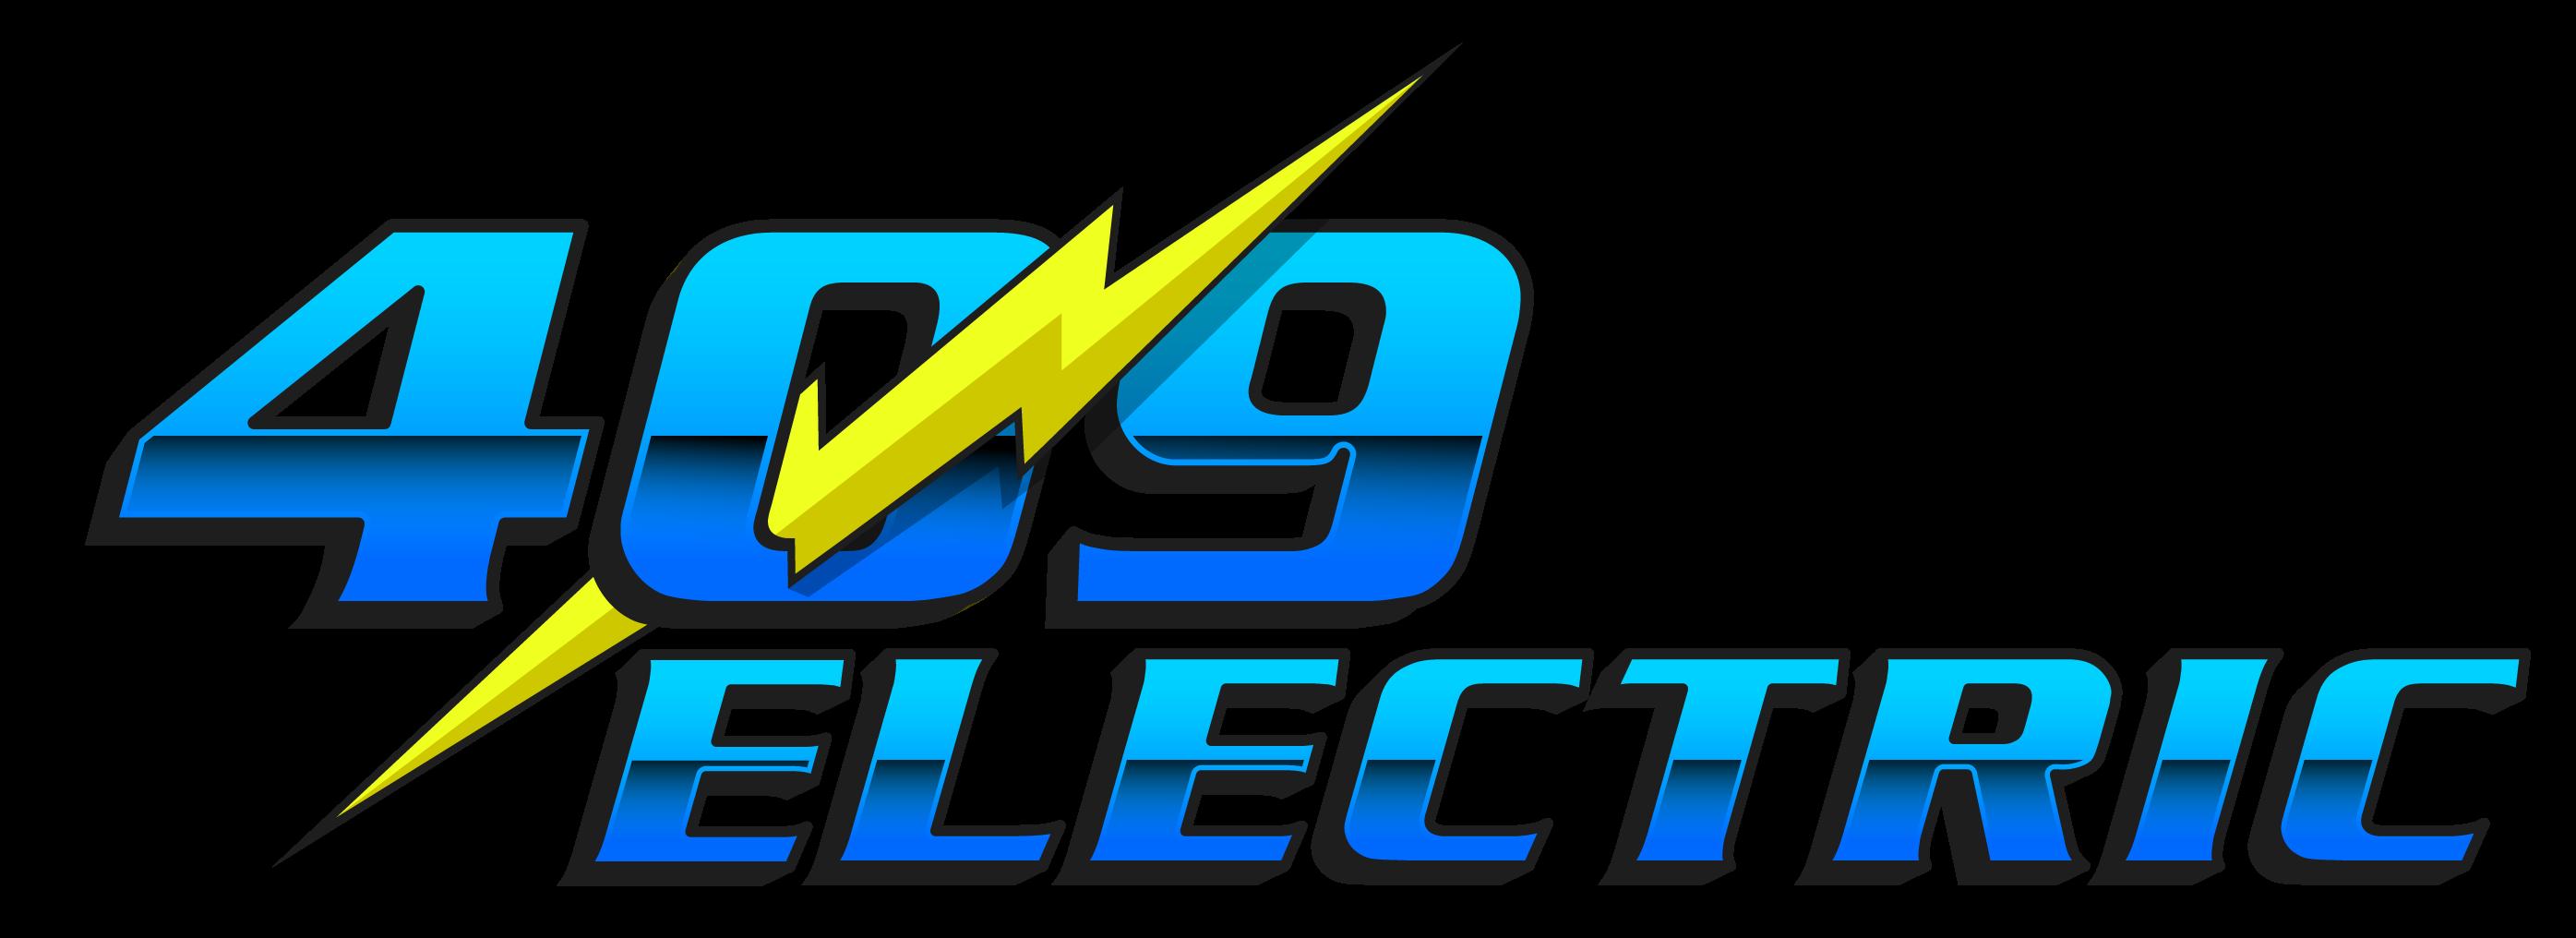 409 Electric